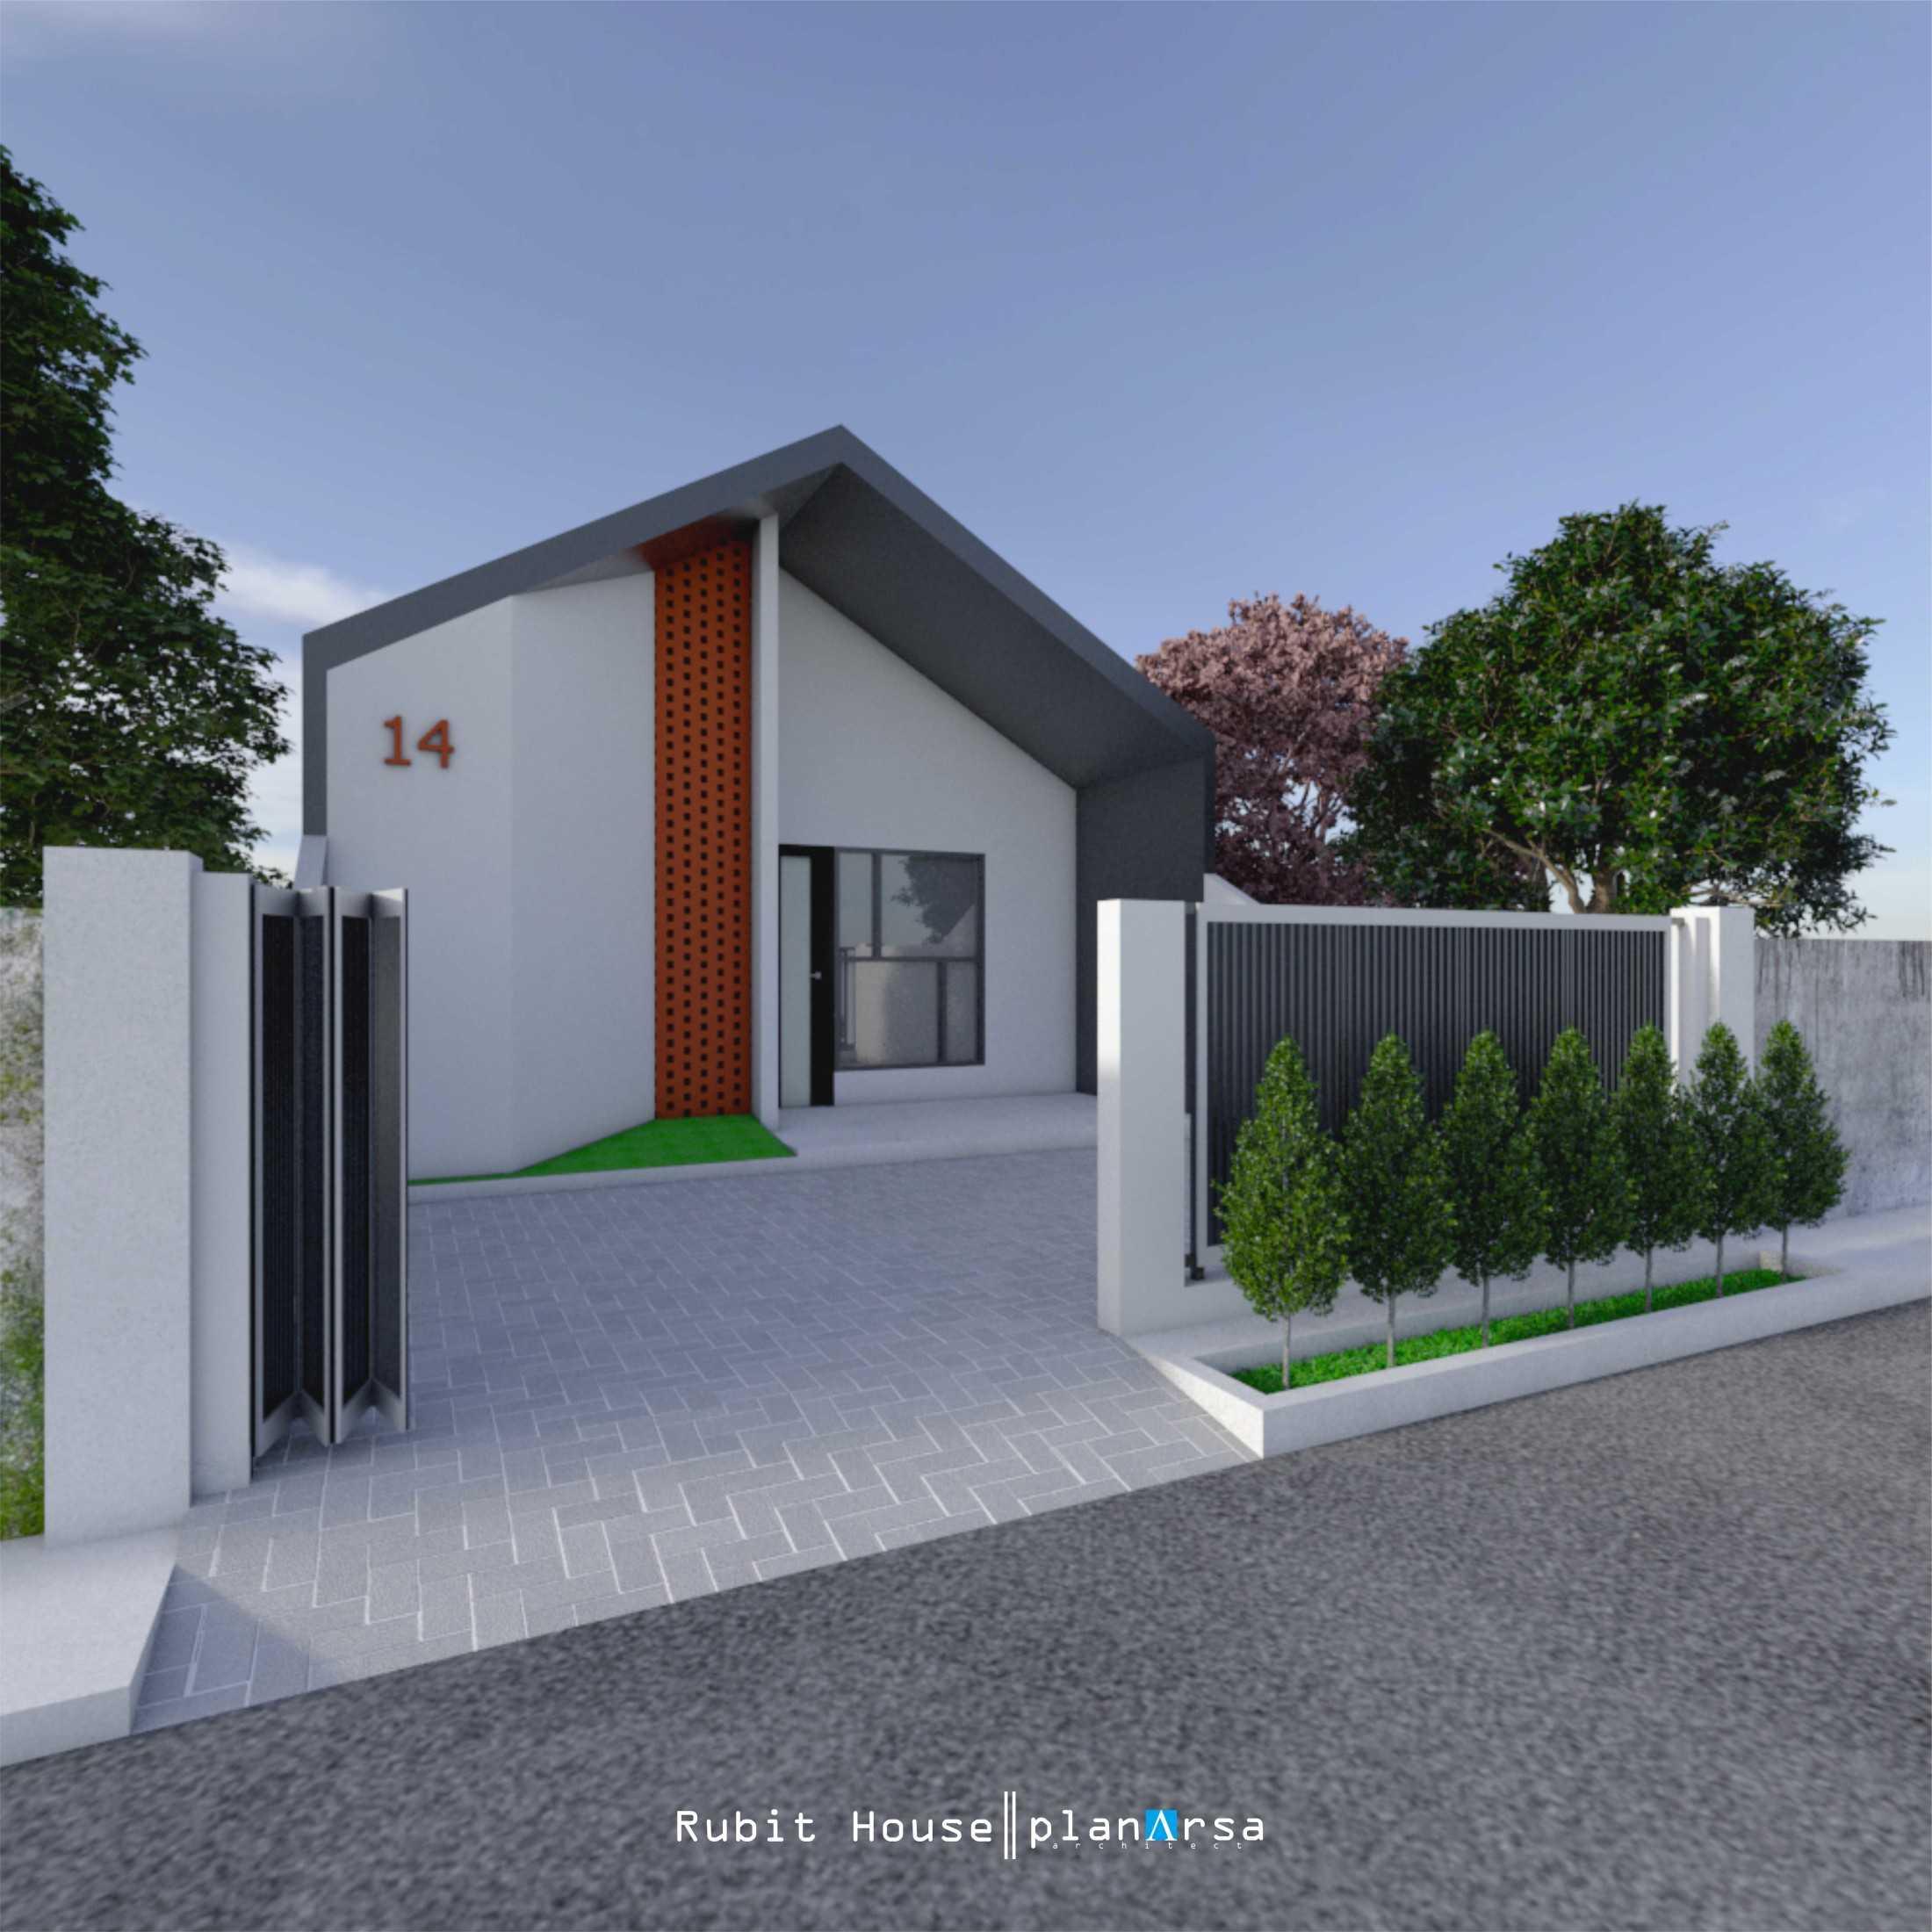 Planarsa Architect Rubit House Aceh, Indonesia Aceh, Indonesia Planarsa-Architect-Rubit-House  79250